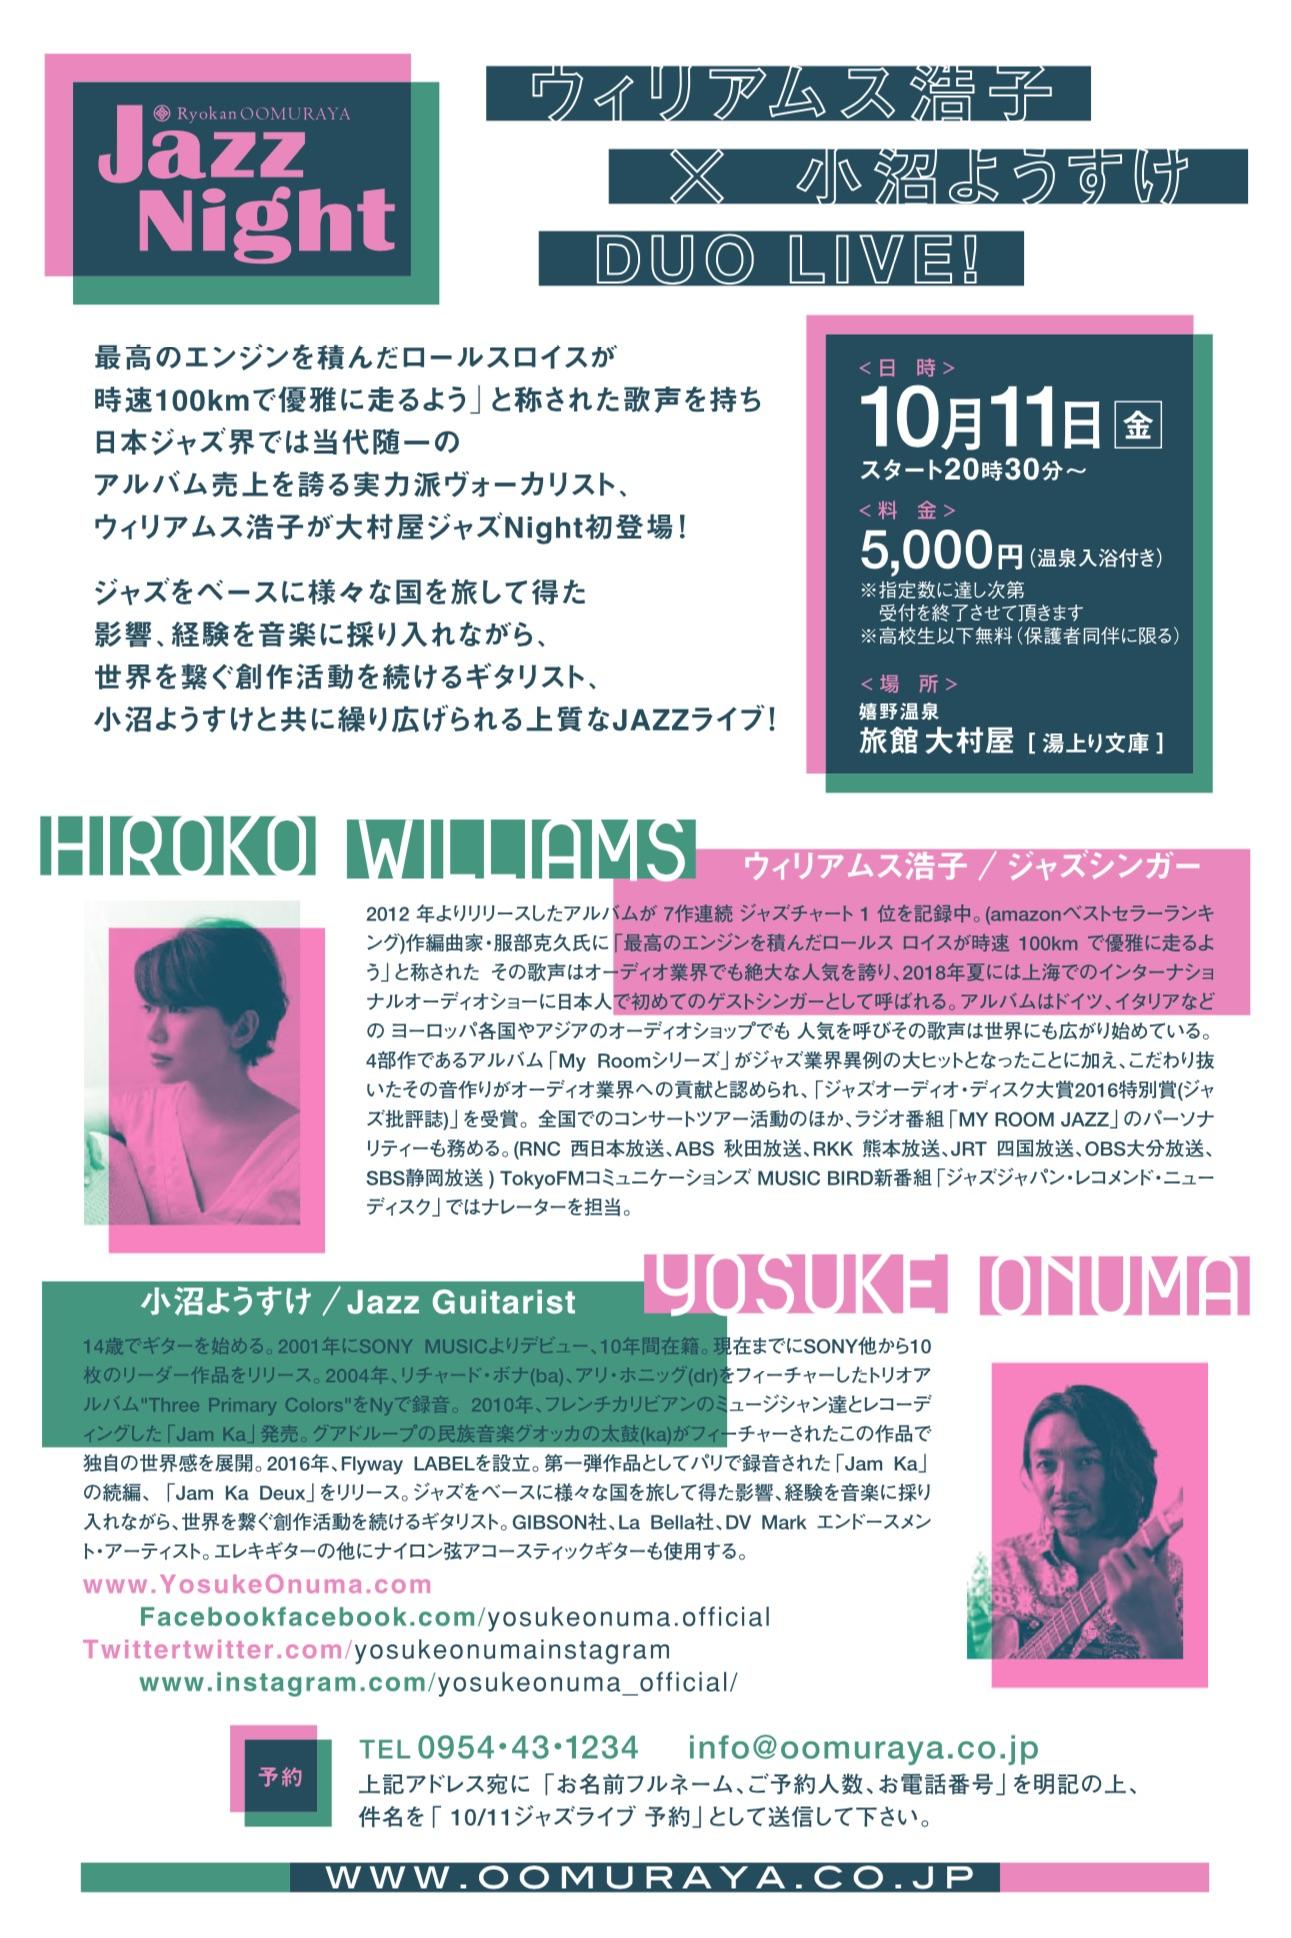 hiroko1011.2